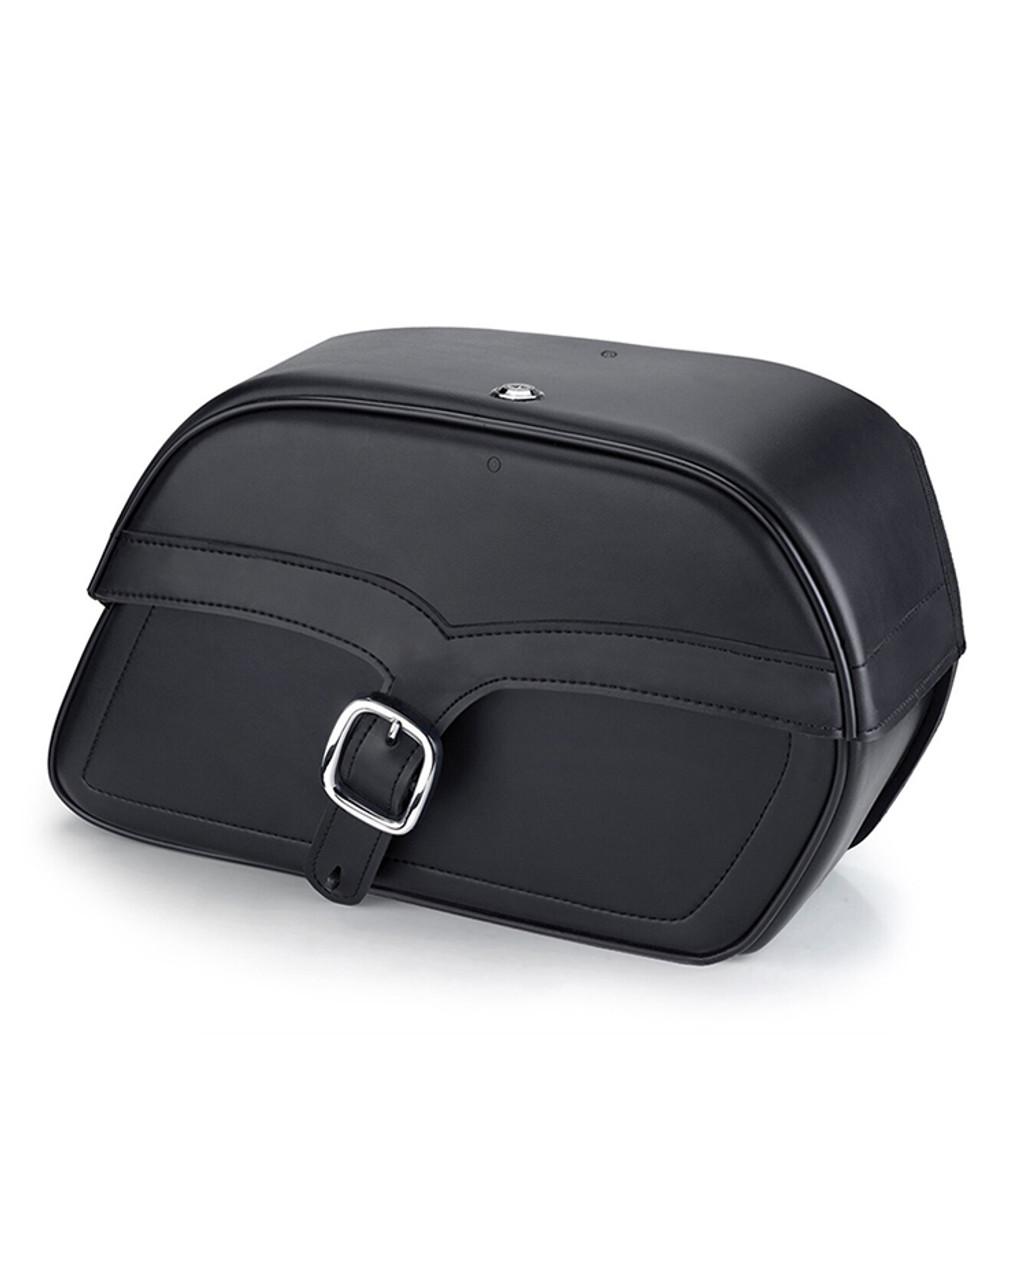 Honda VTX 1800 N Charger Single Strap Large Motorcycle Saddlebags Main Bag View